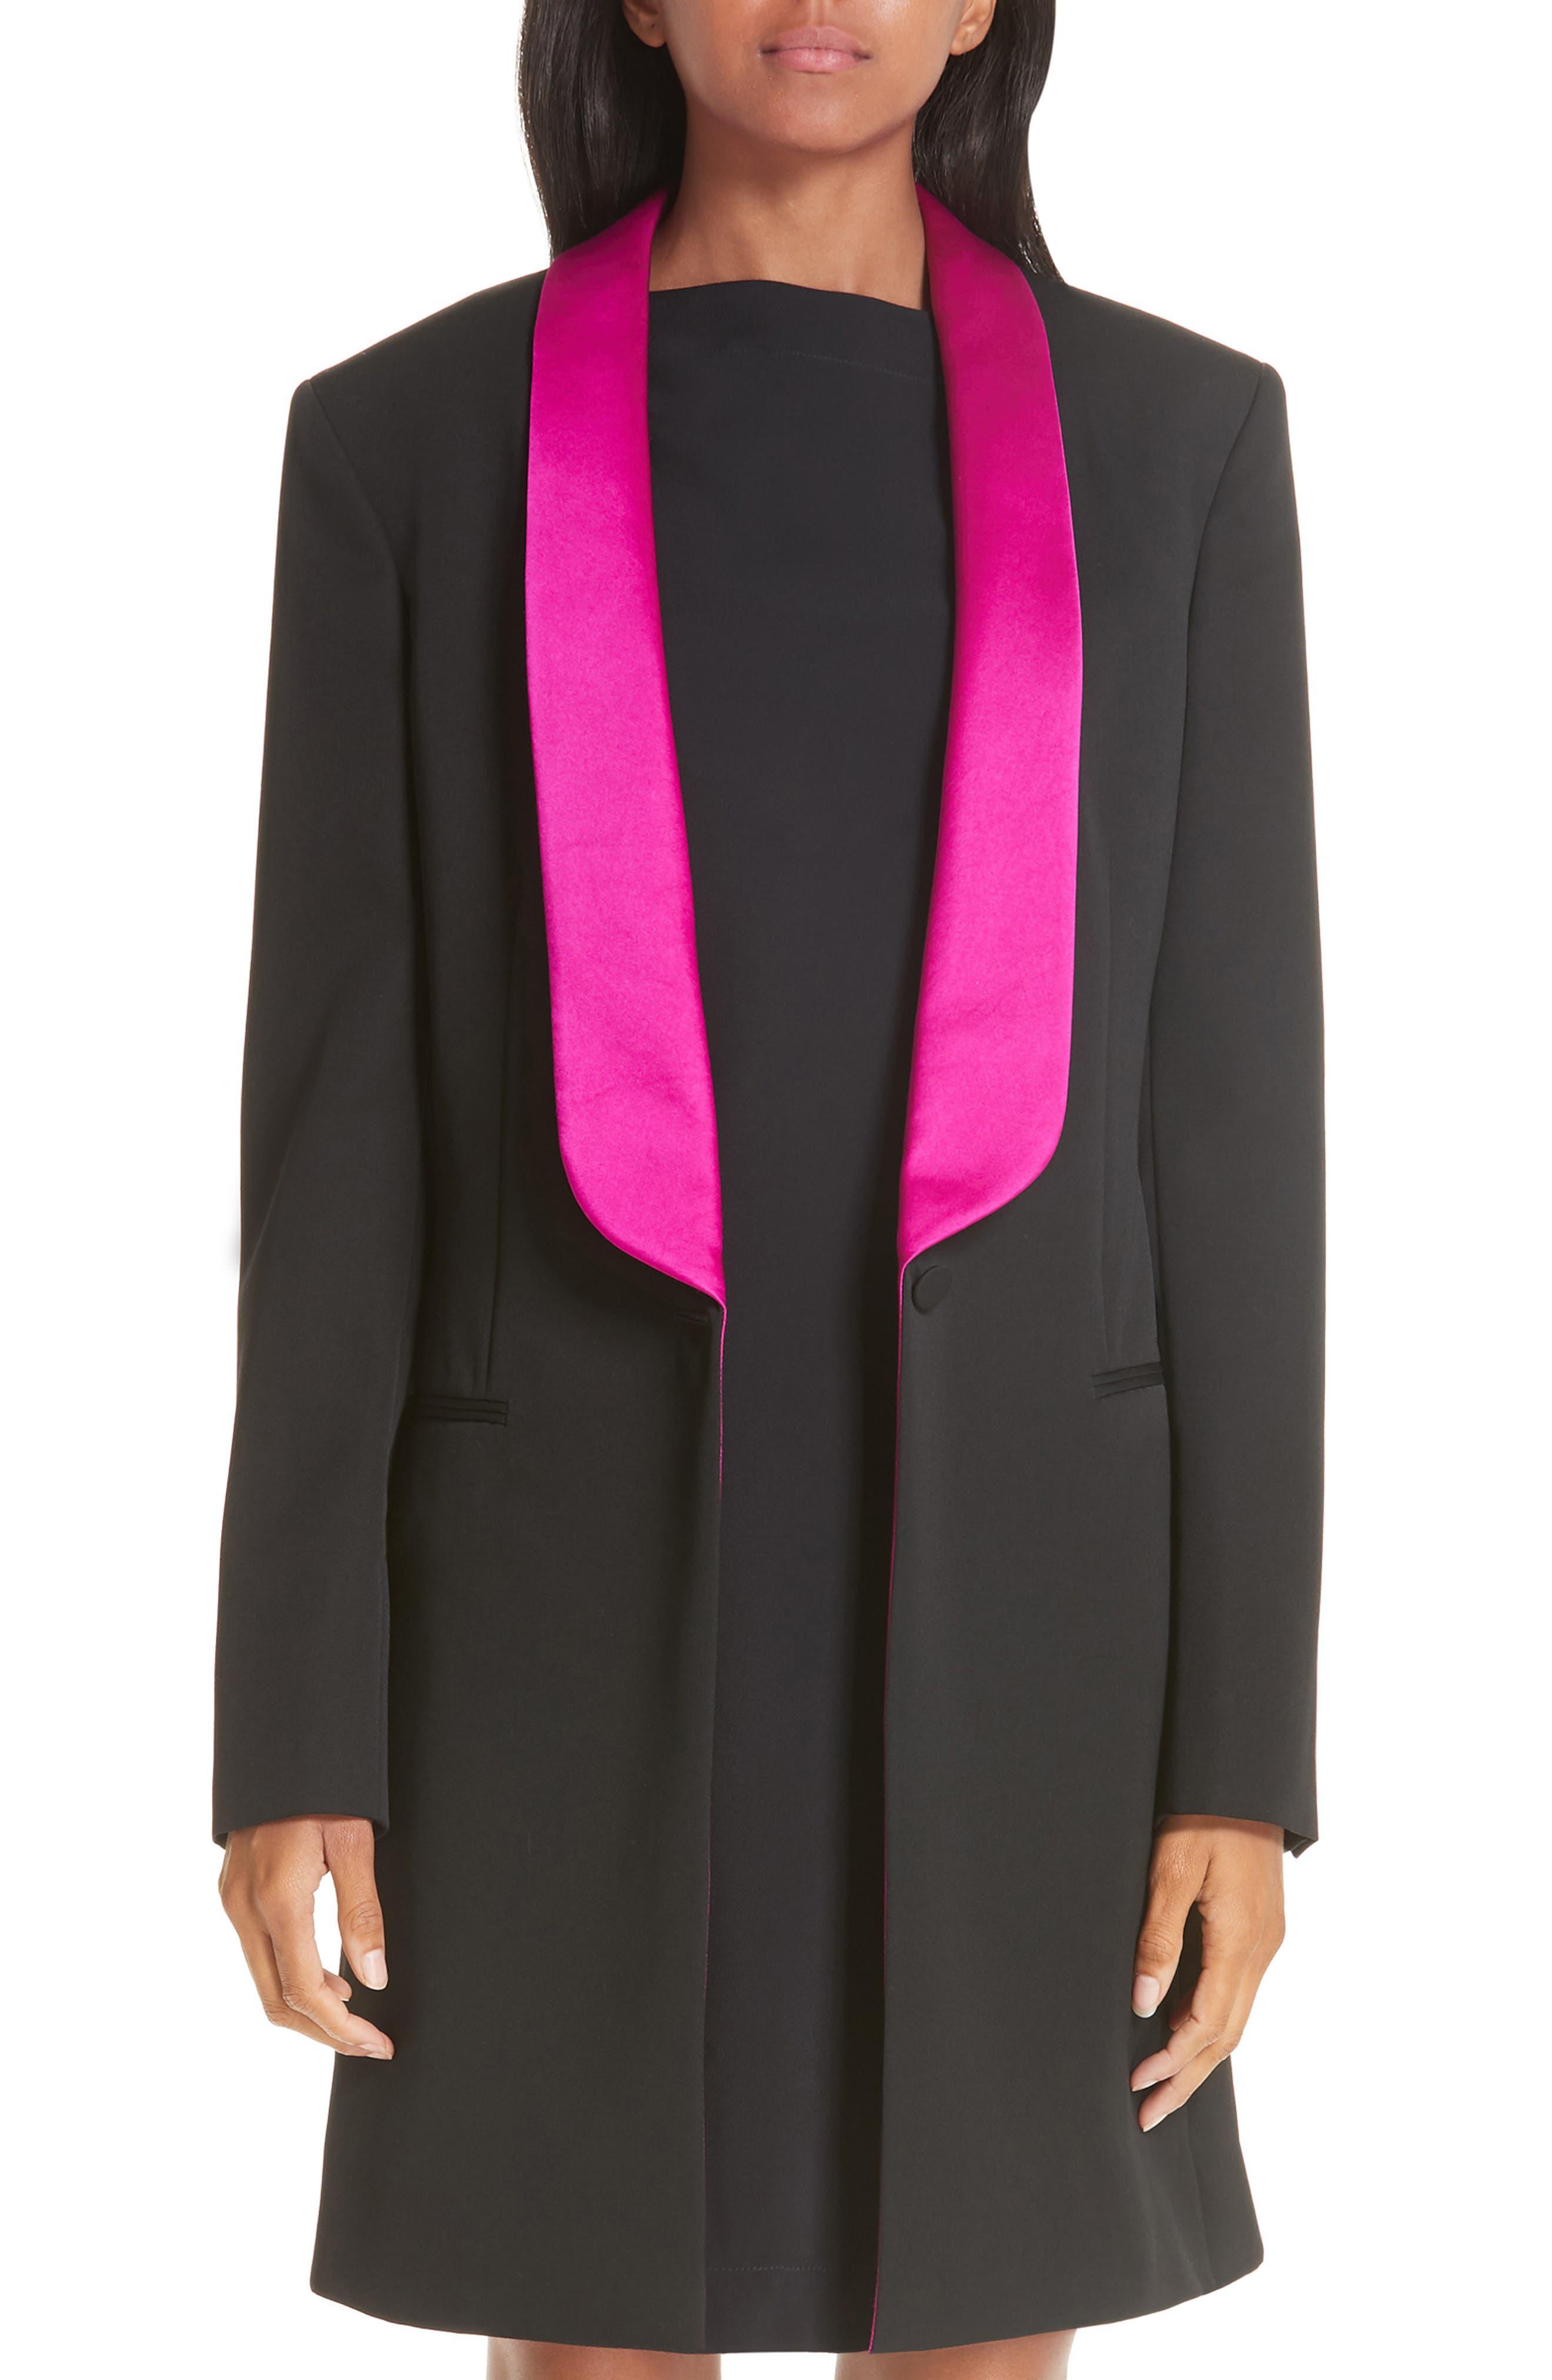 CALVIN KLEIN 205W39NYC Contrast Lapel Wool Gabardine Jacket, Main, color, BLACK DARK ORCHID